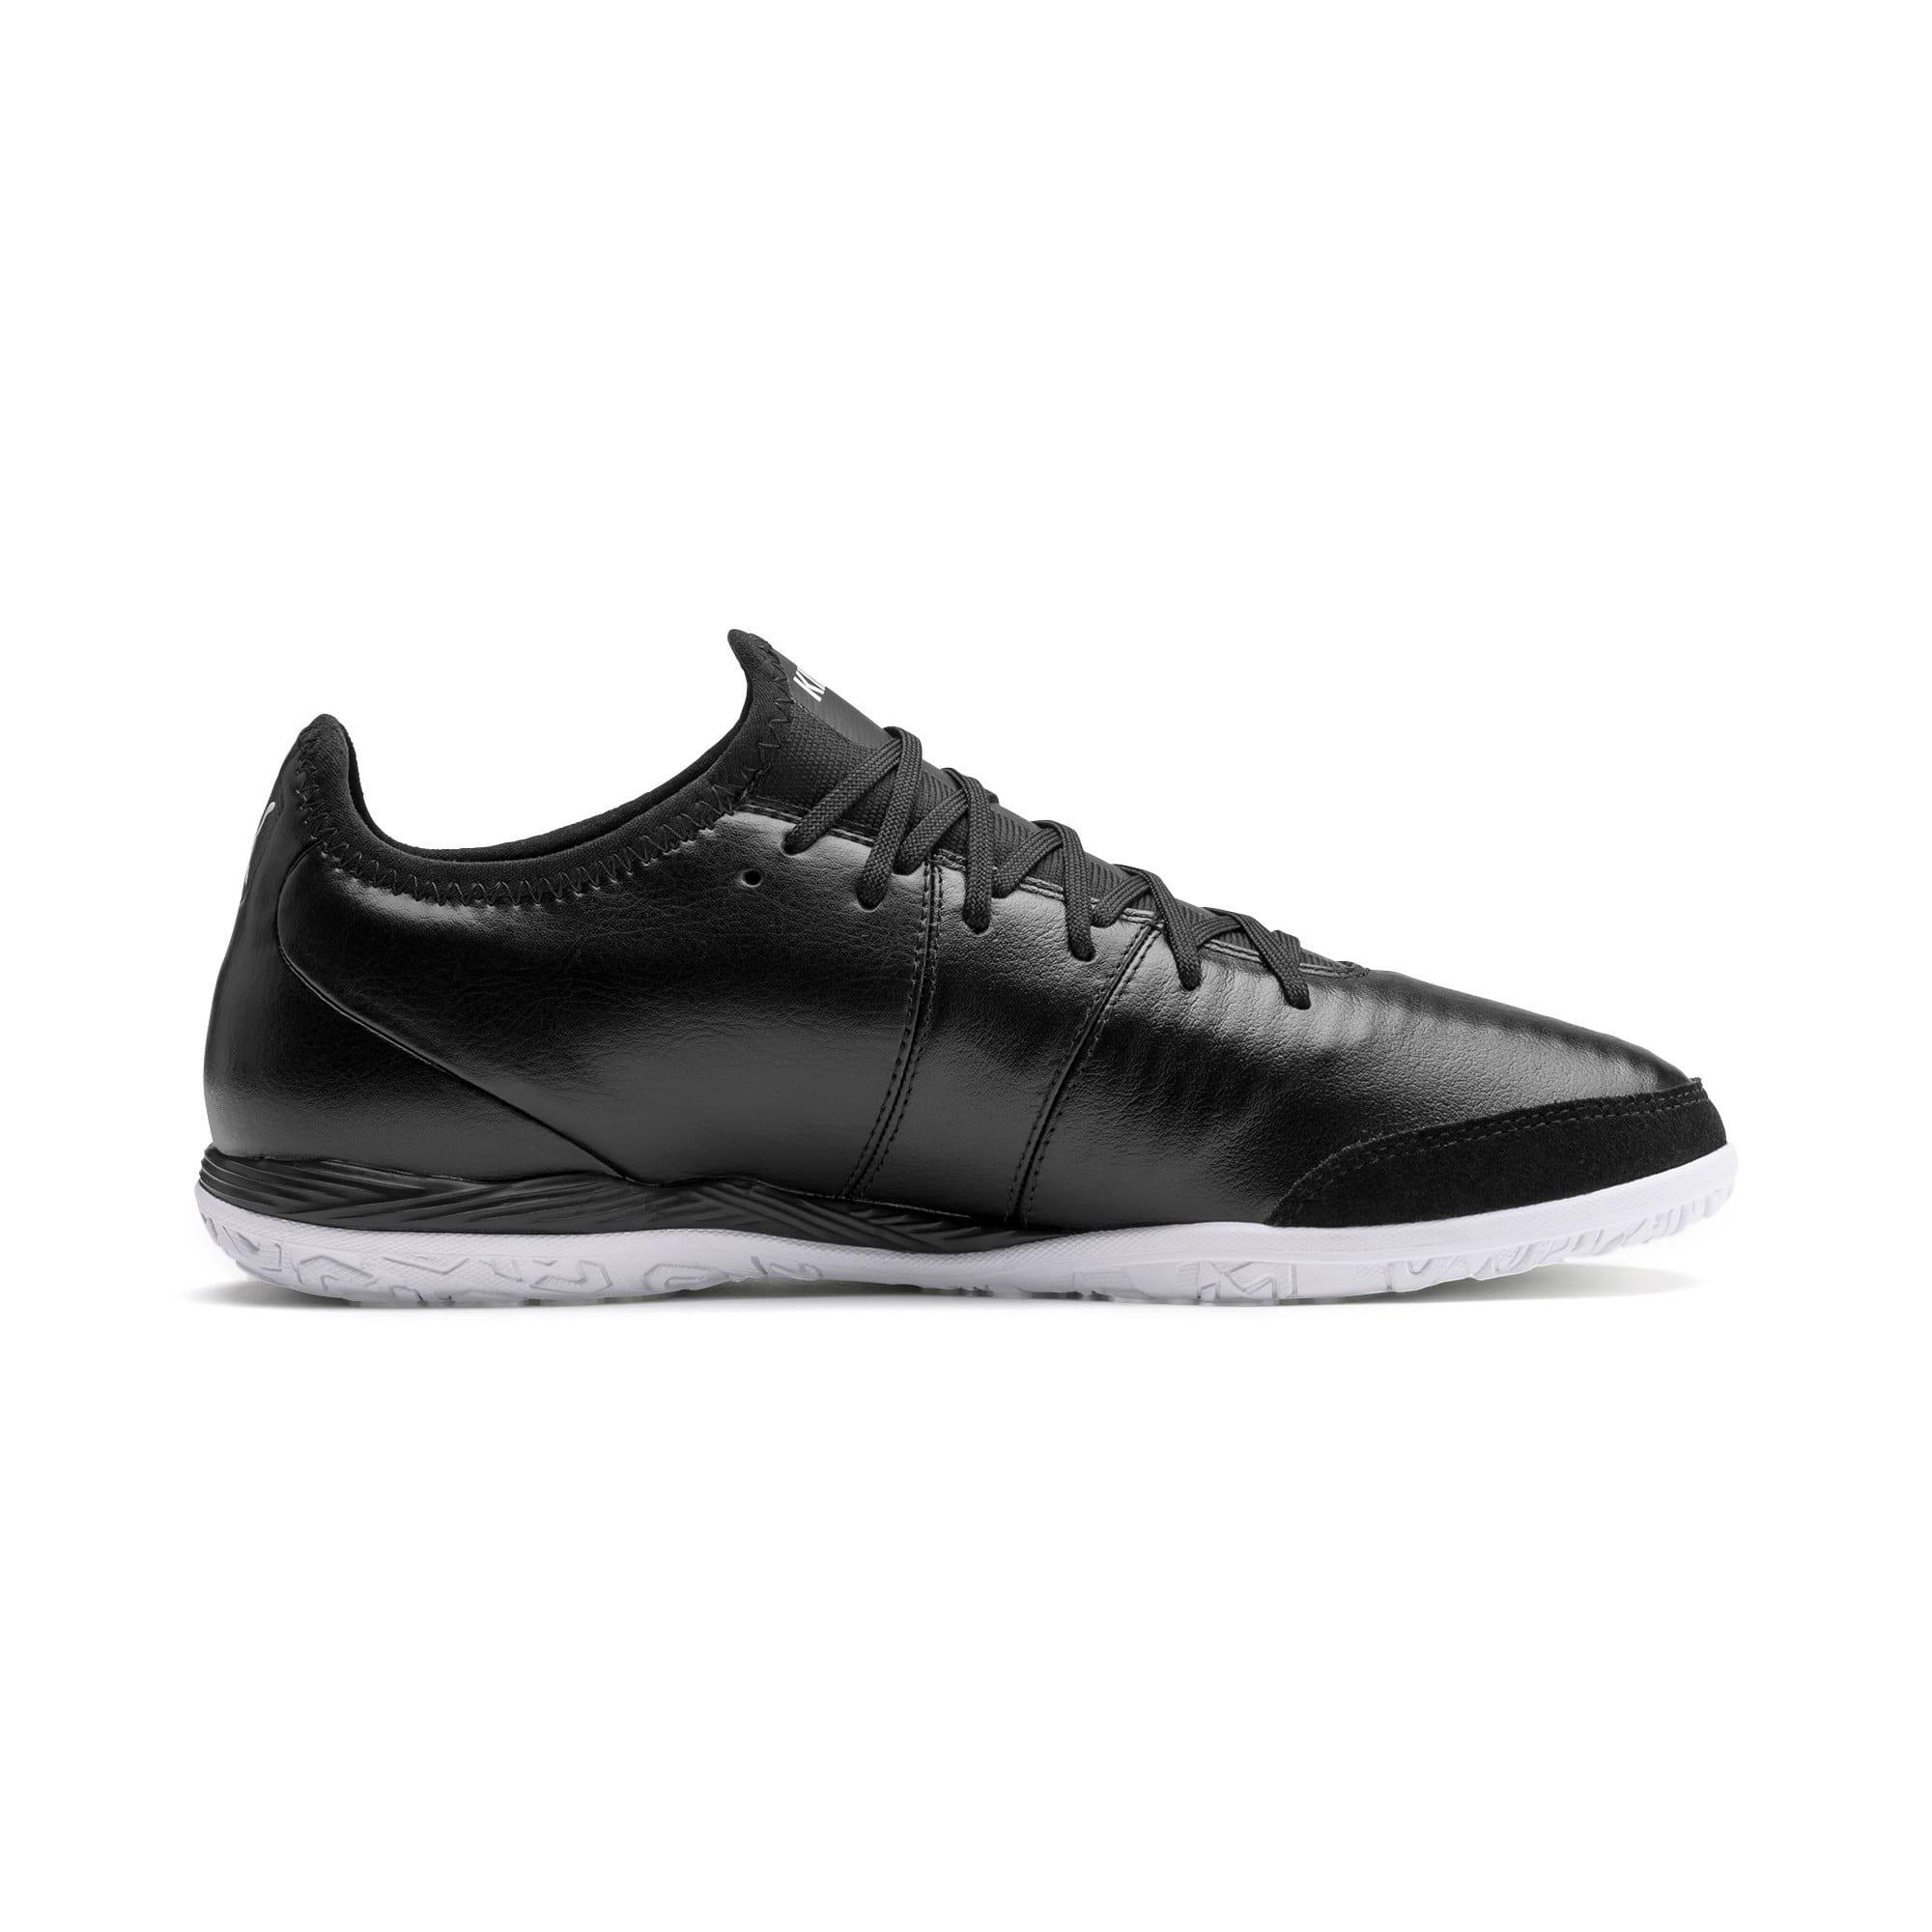 Thumbnail 6 of King Pro IT Soccer Shoes, Puma Black-Puma White, medium